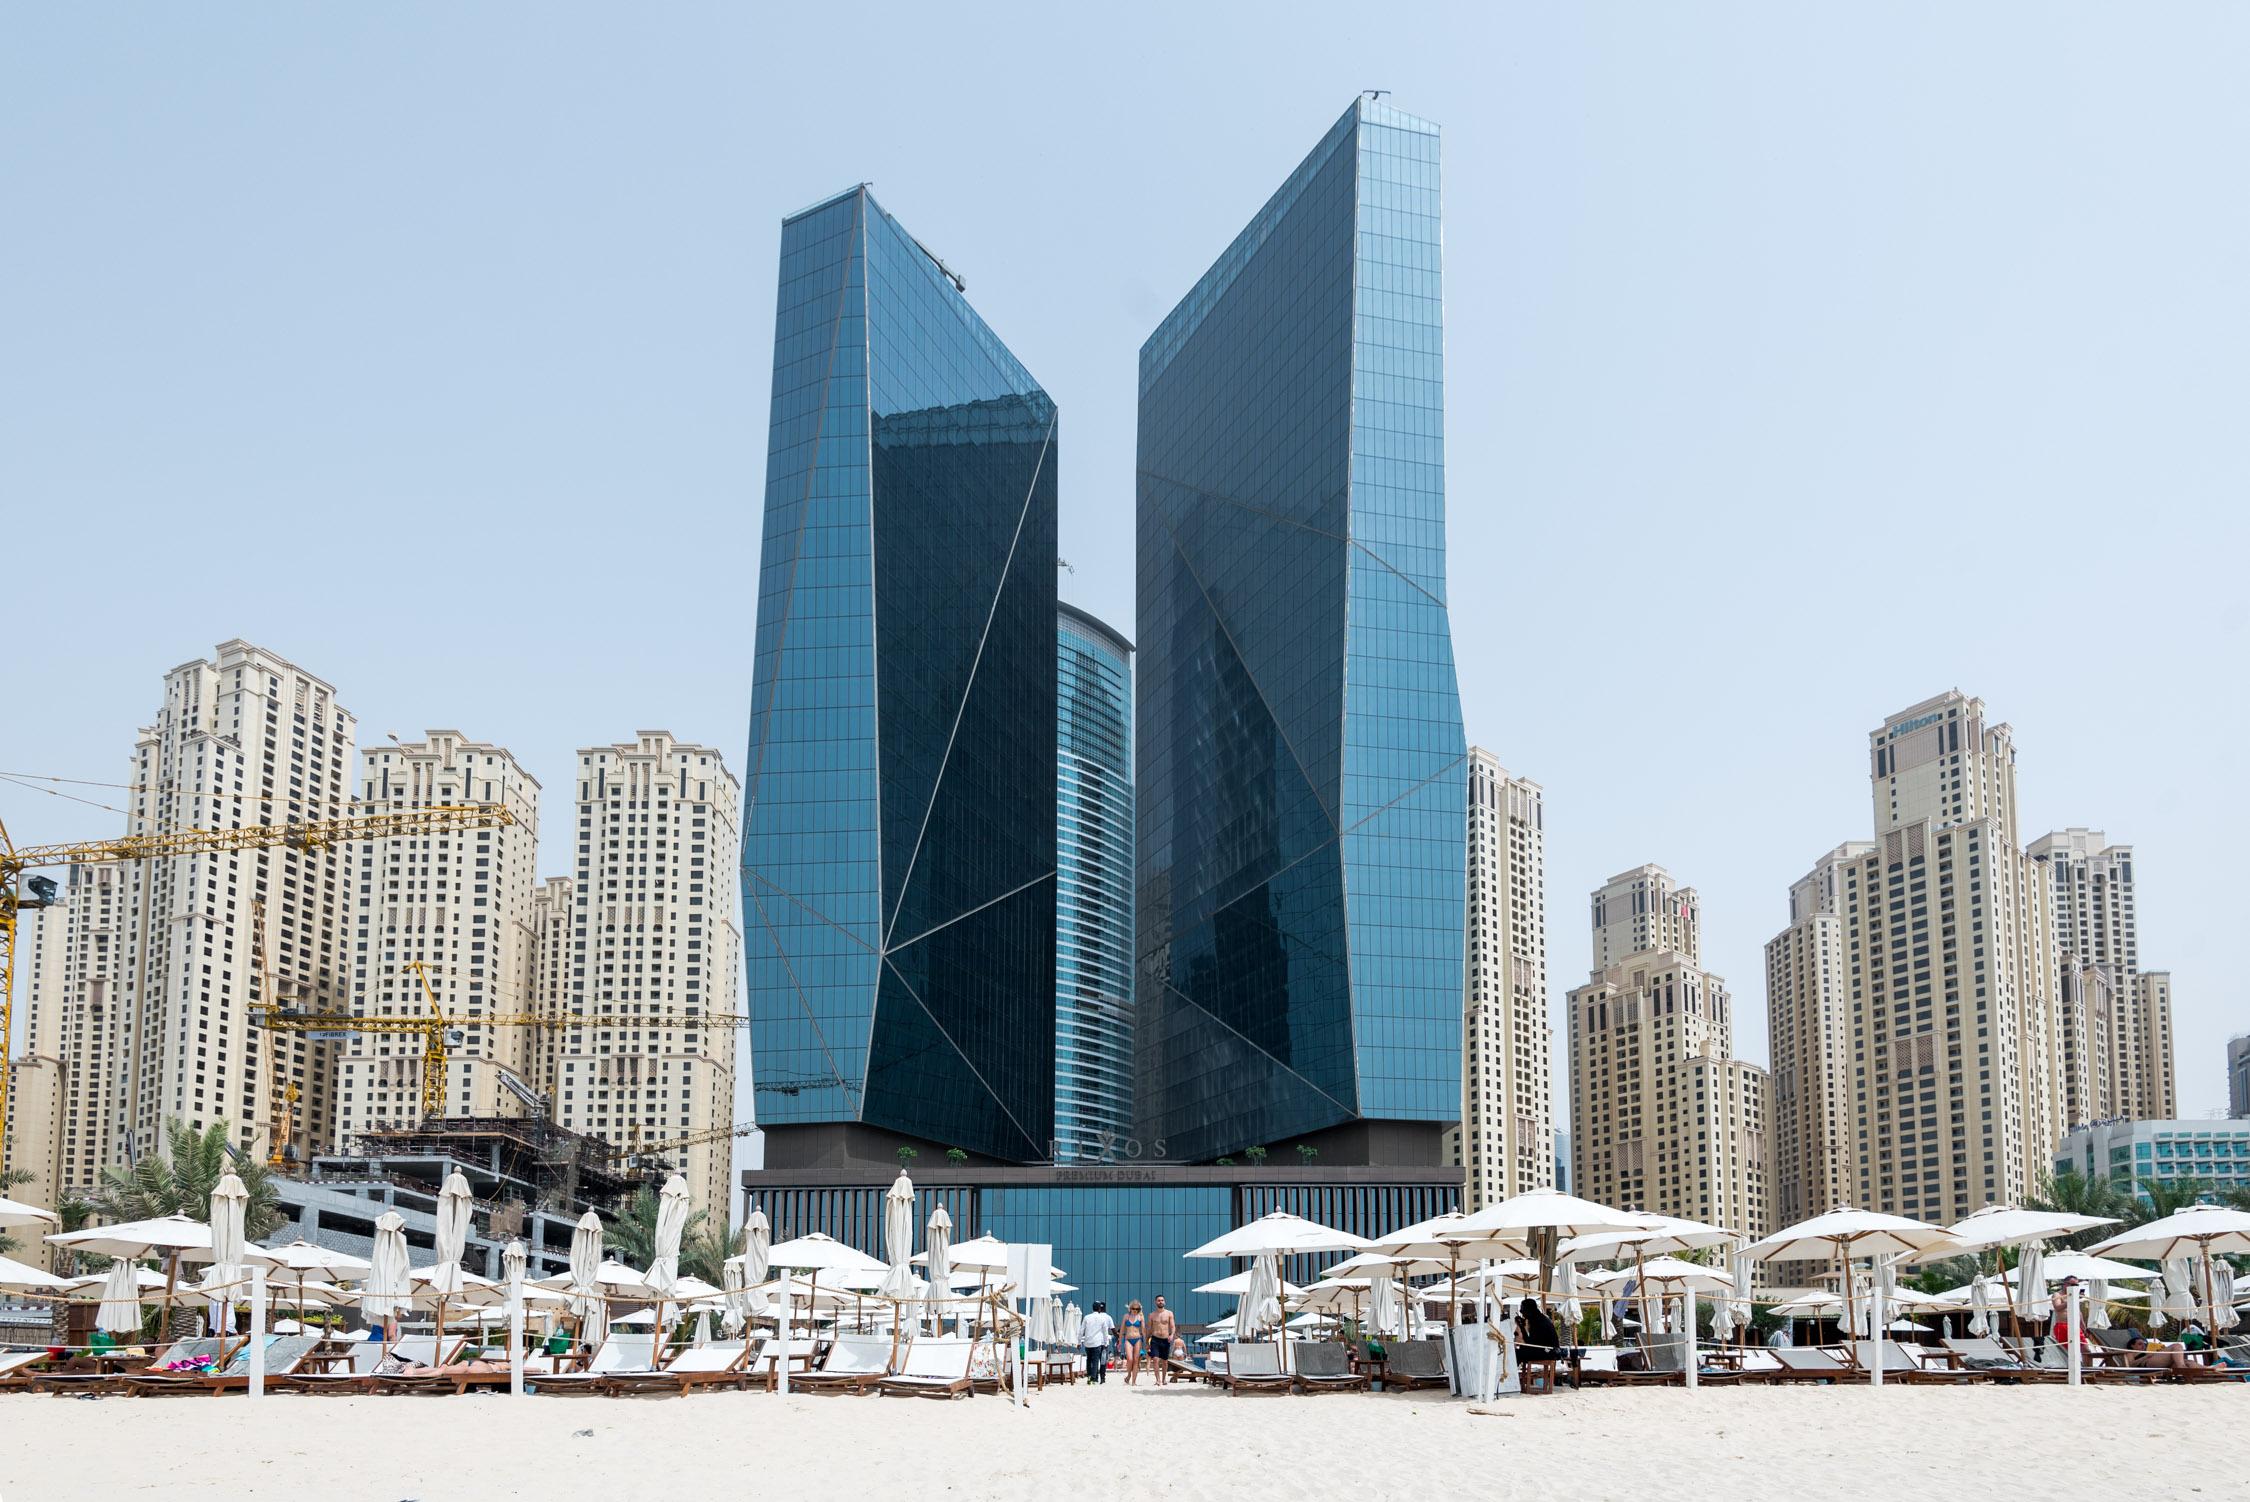 Dubai-261-20180510.jpg